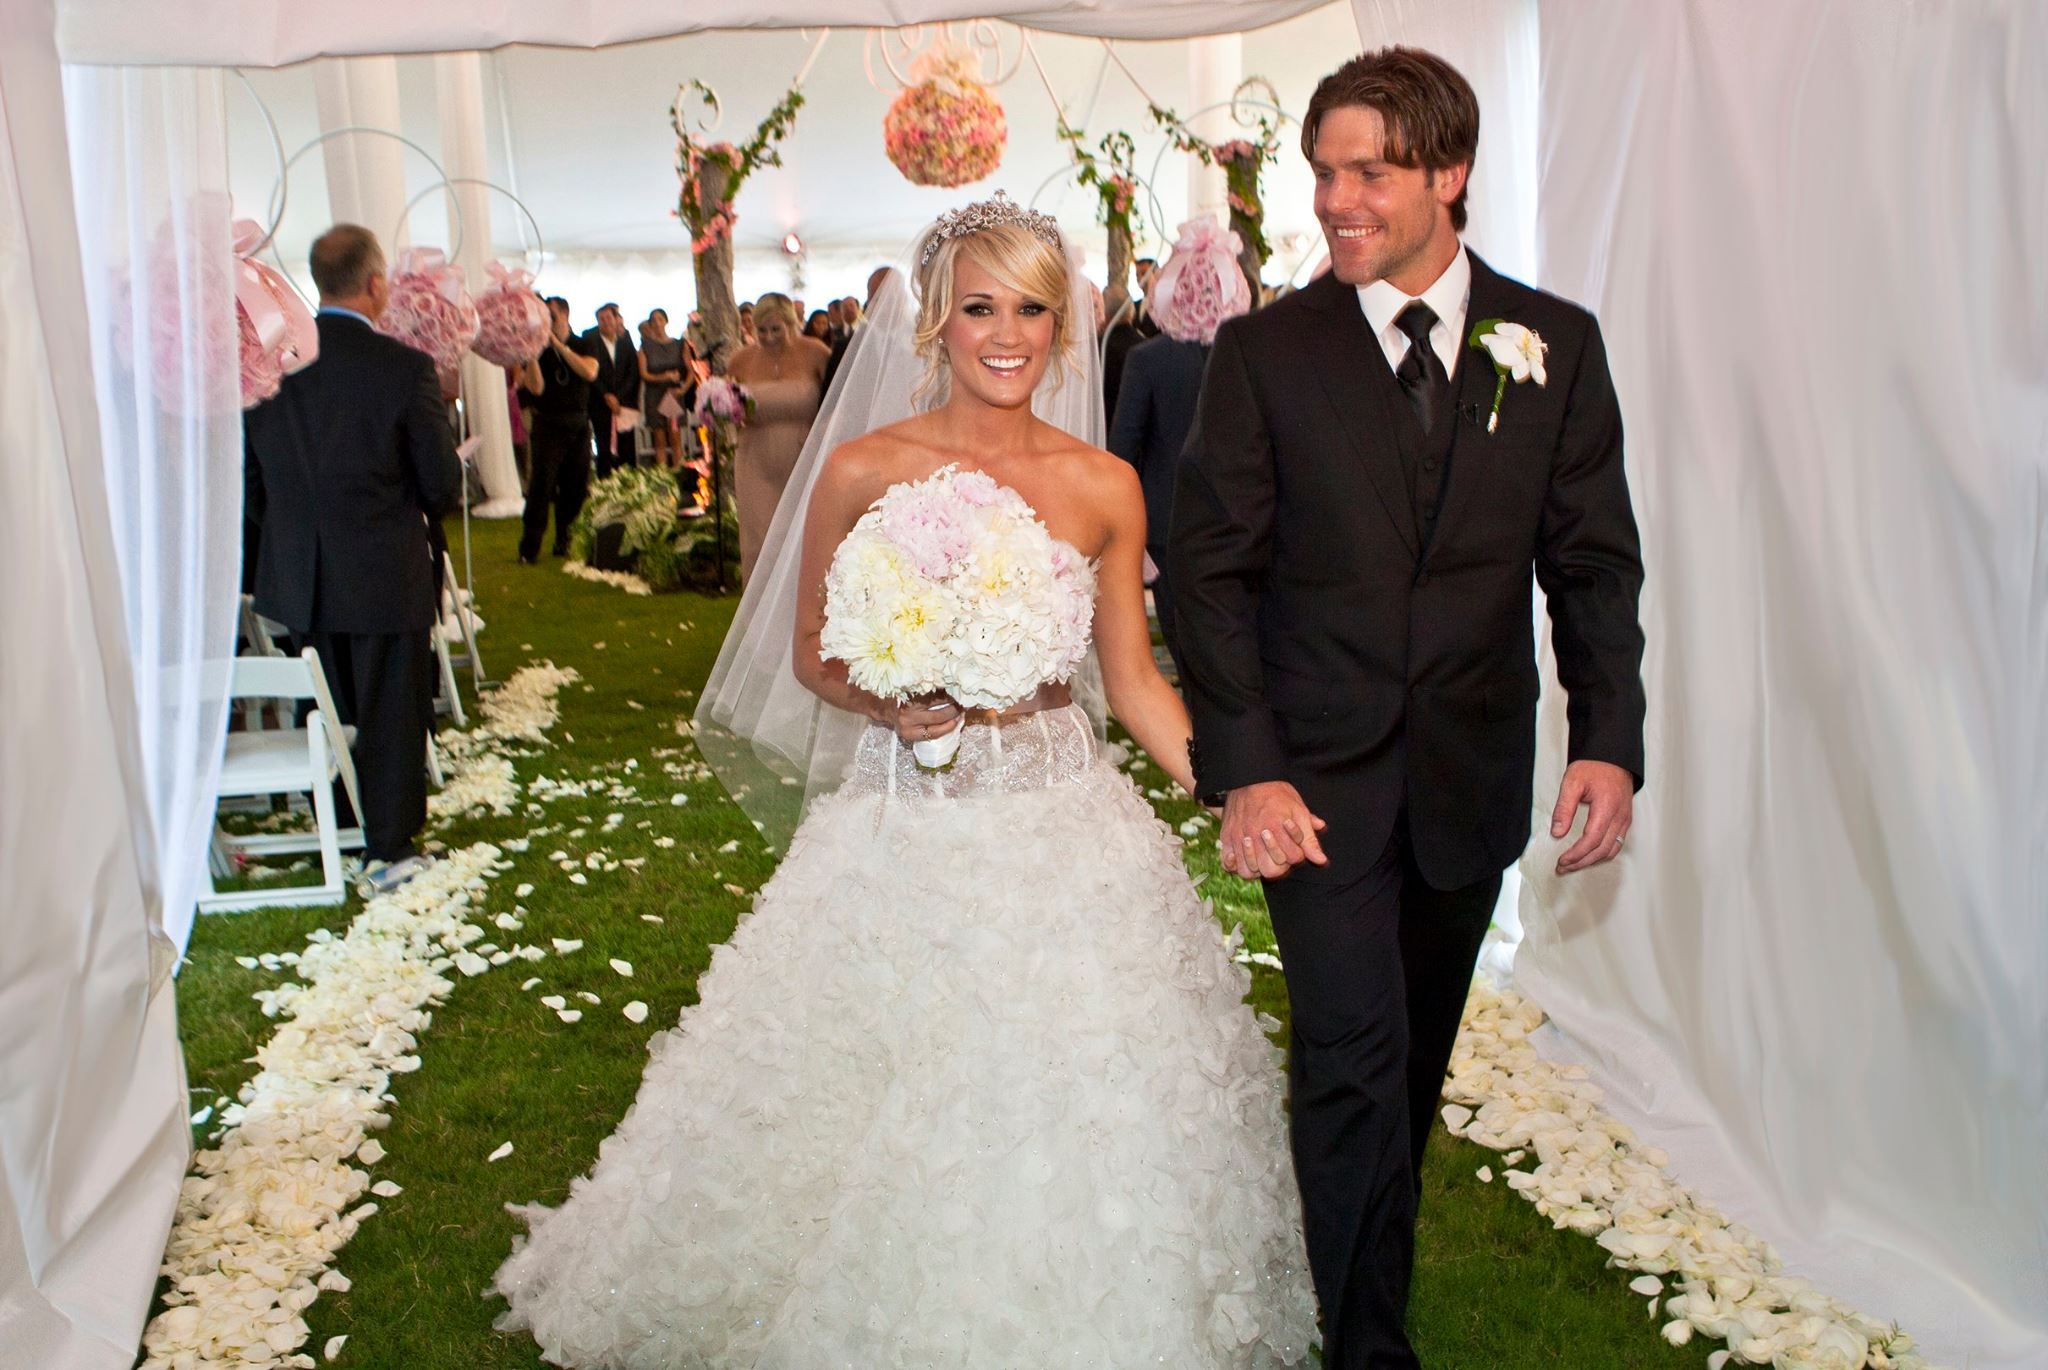 Carrie Underwood's Wedding